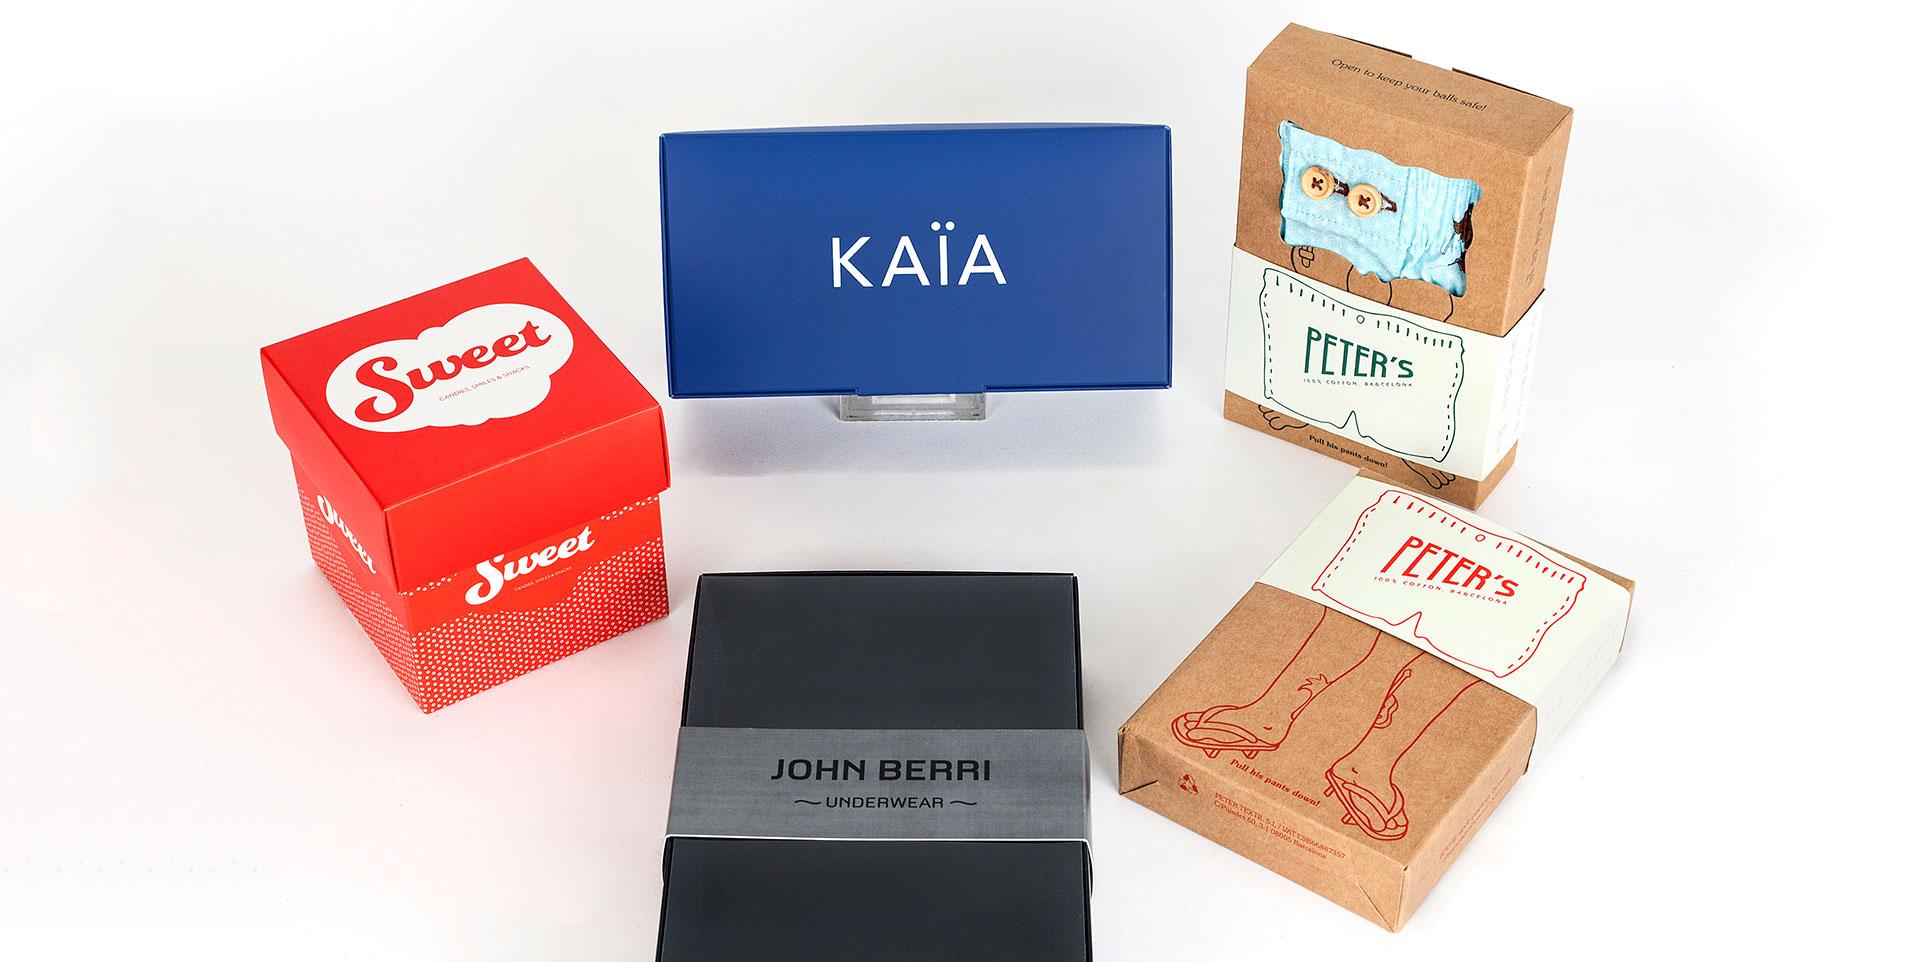 encaja-cajas-a-medida-forradas-pequena-cantidades-packaging-360-2.jpg